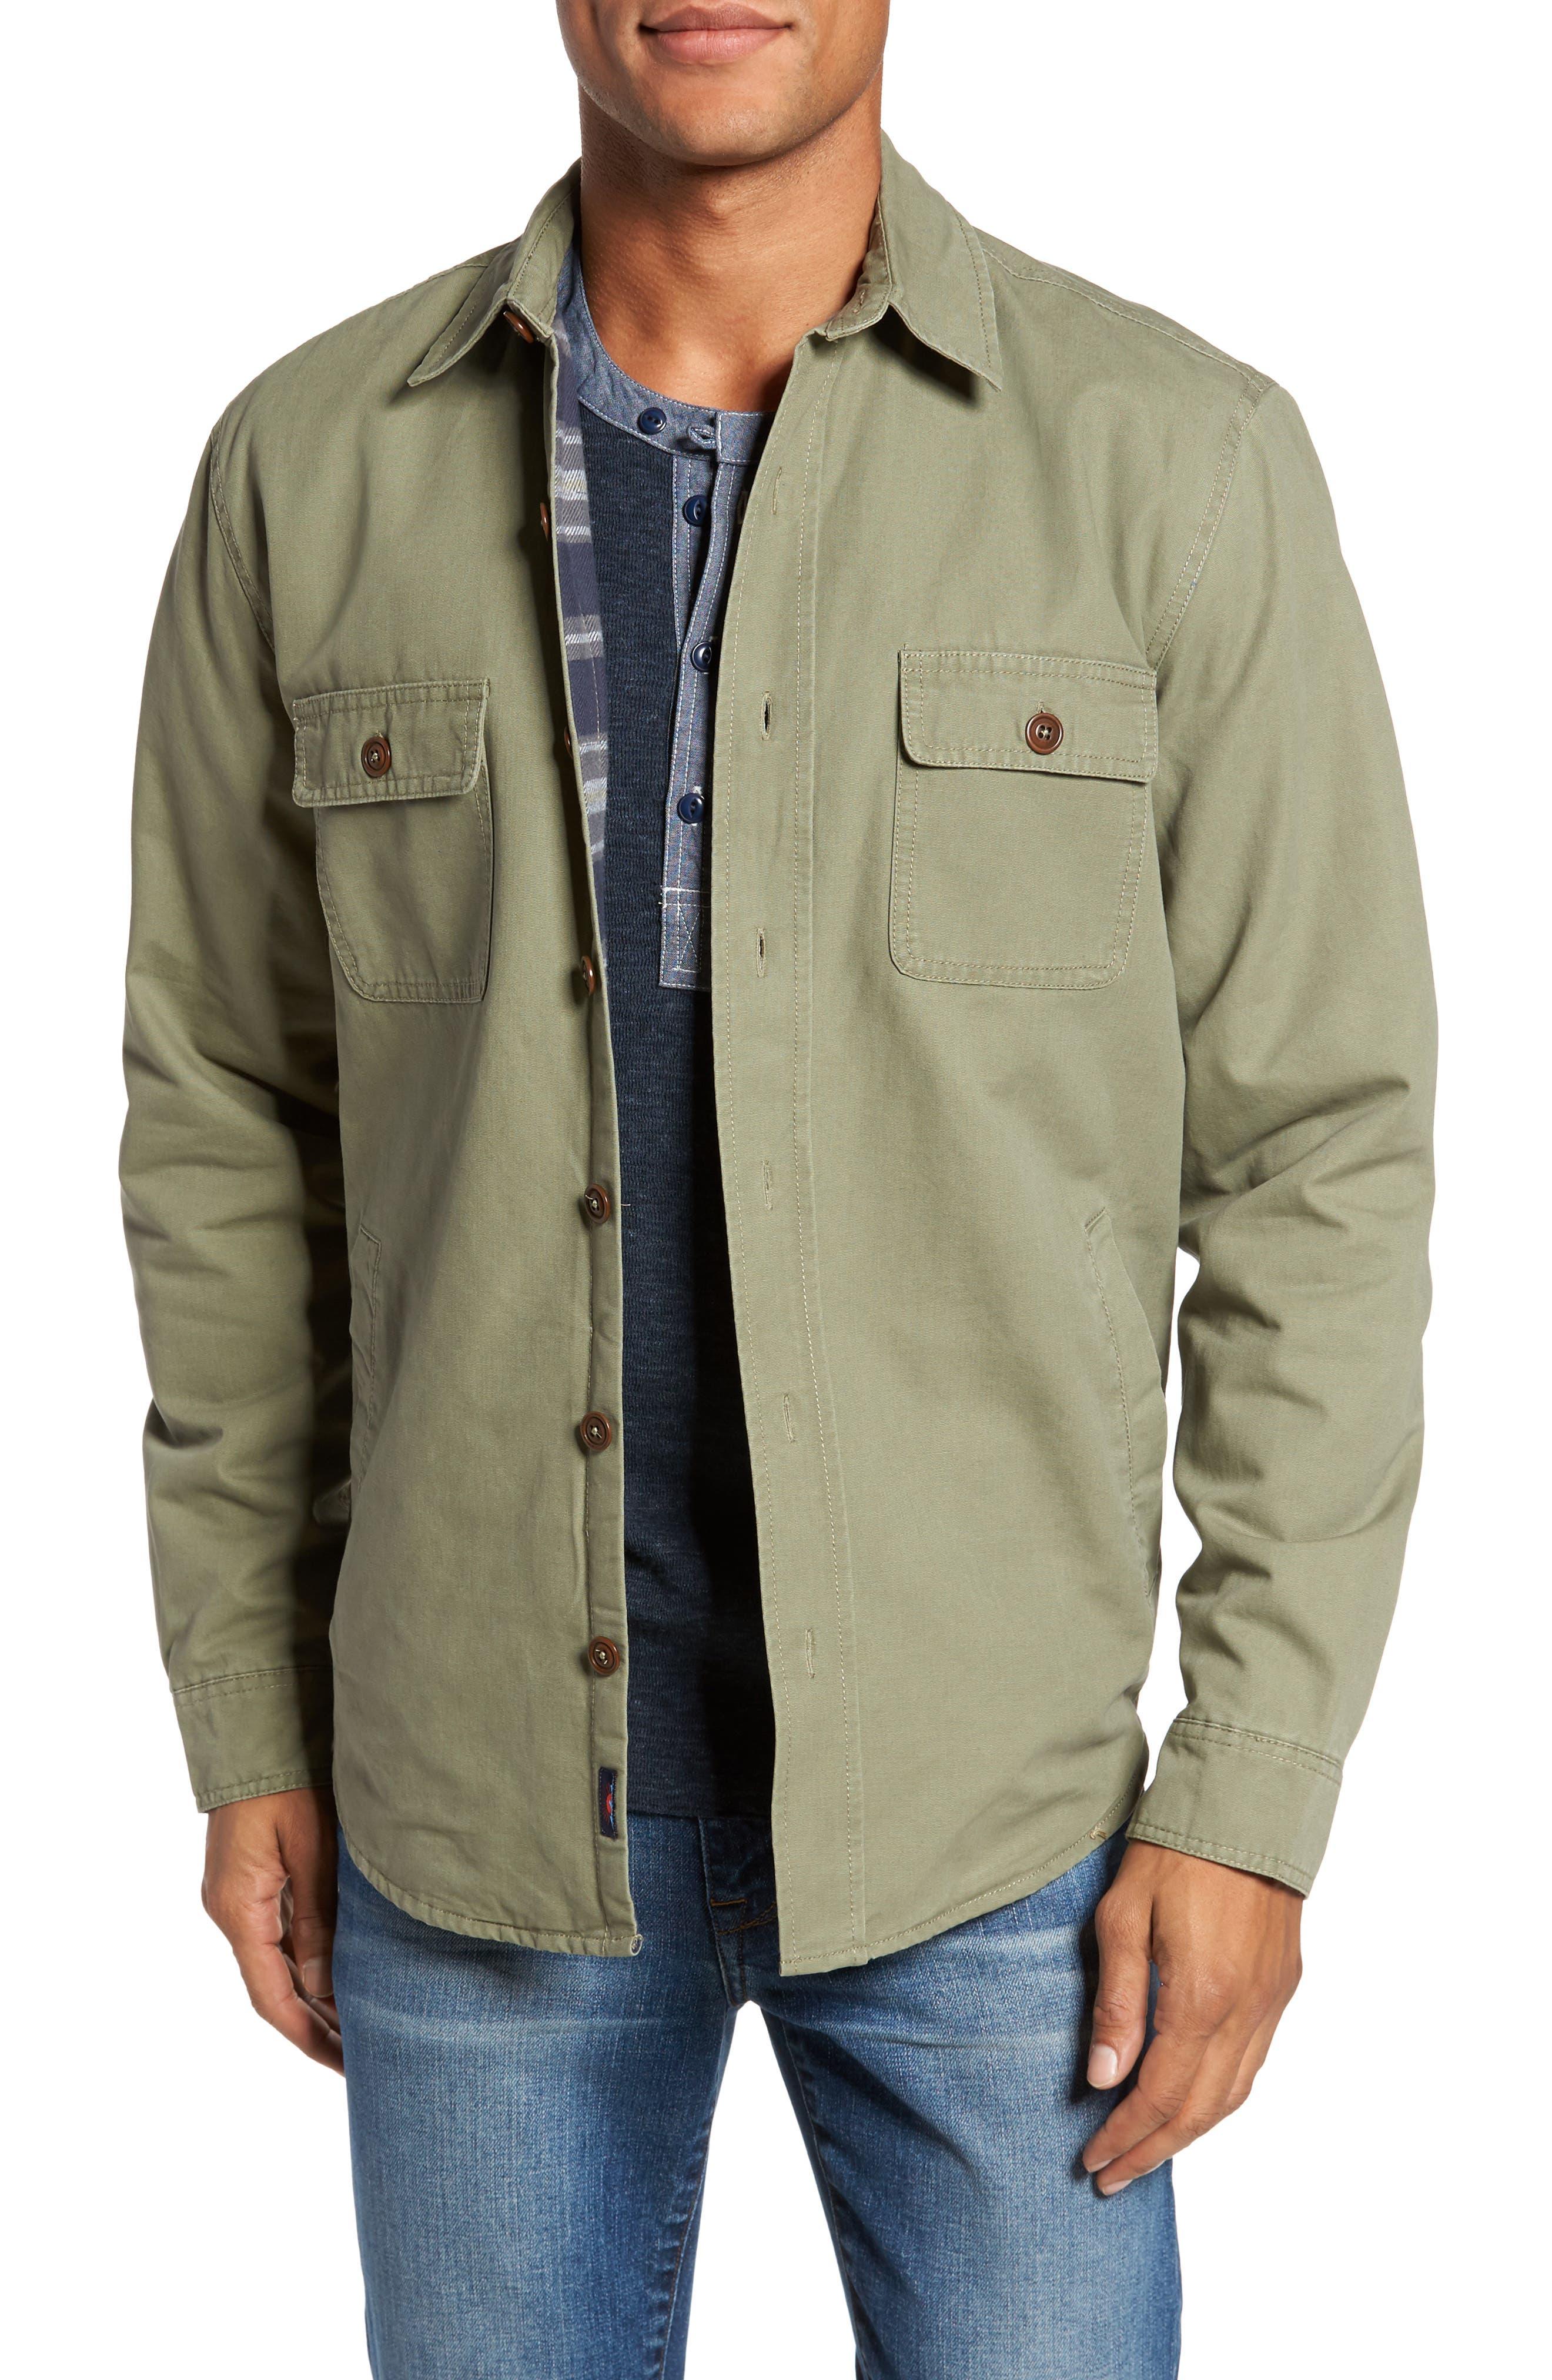 Main Image - Faherty Blanket Lined Shirt Jacket